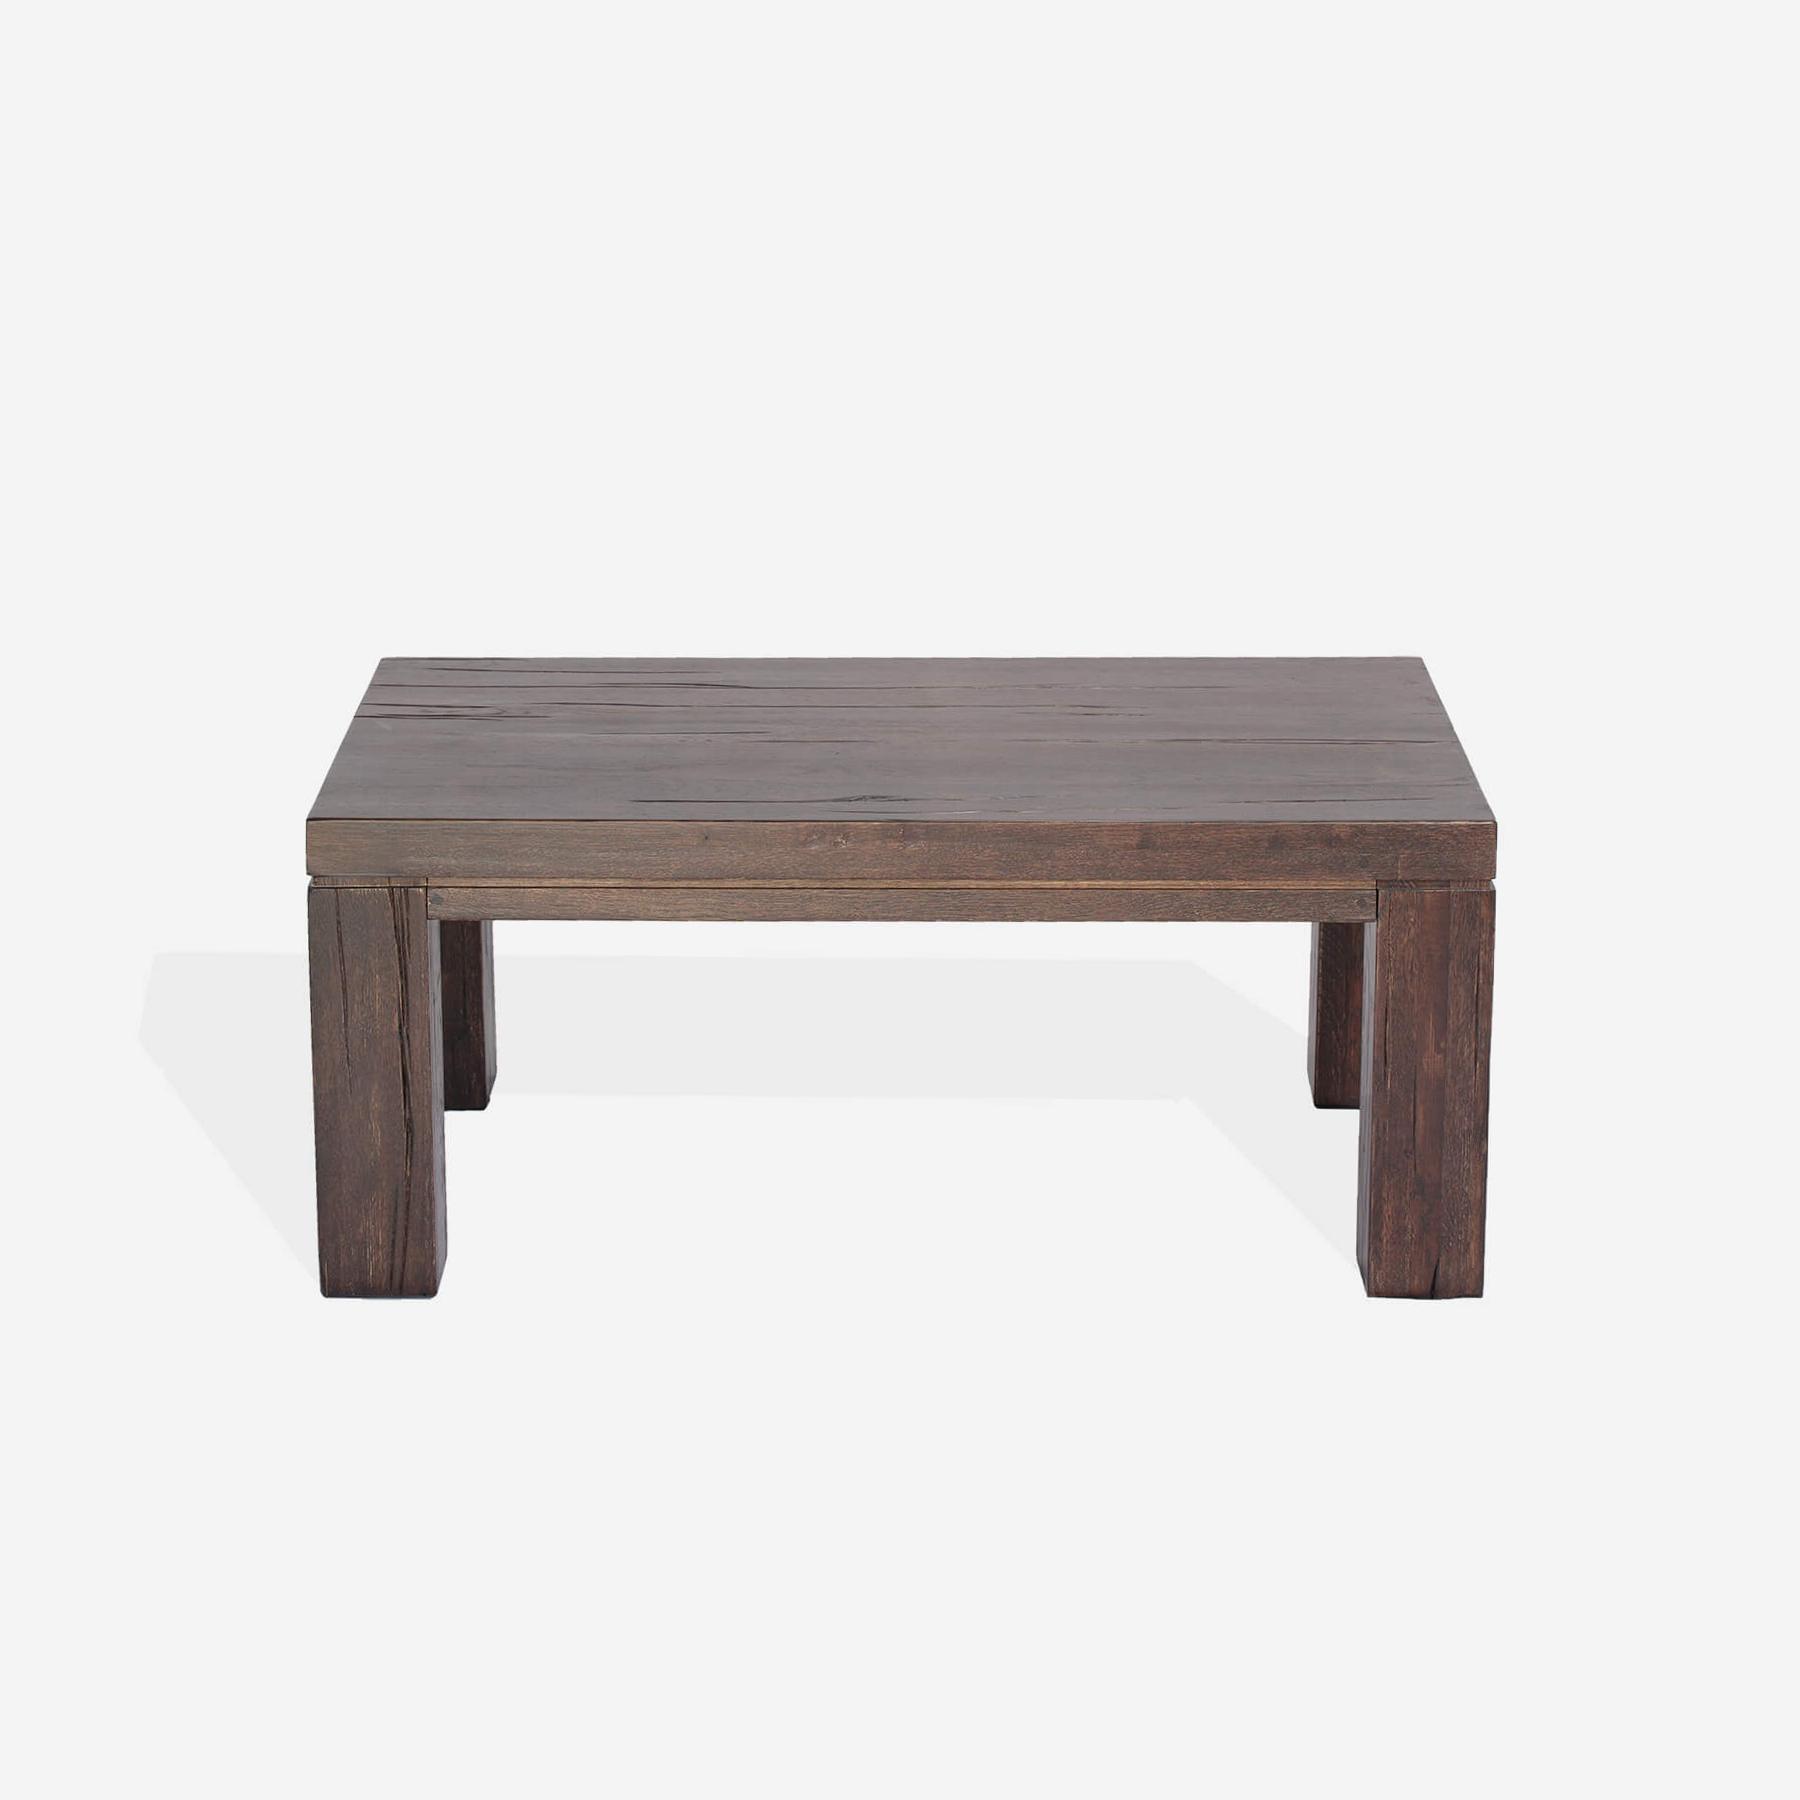 Masa de cafea din lemn de stejar salbatic Texas, L120xl70xH50 cm imagine